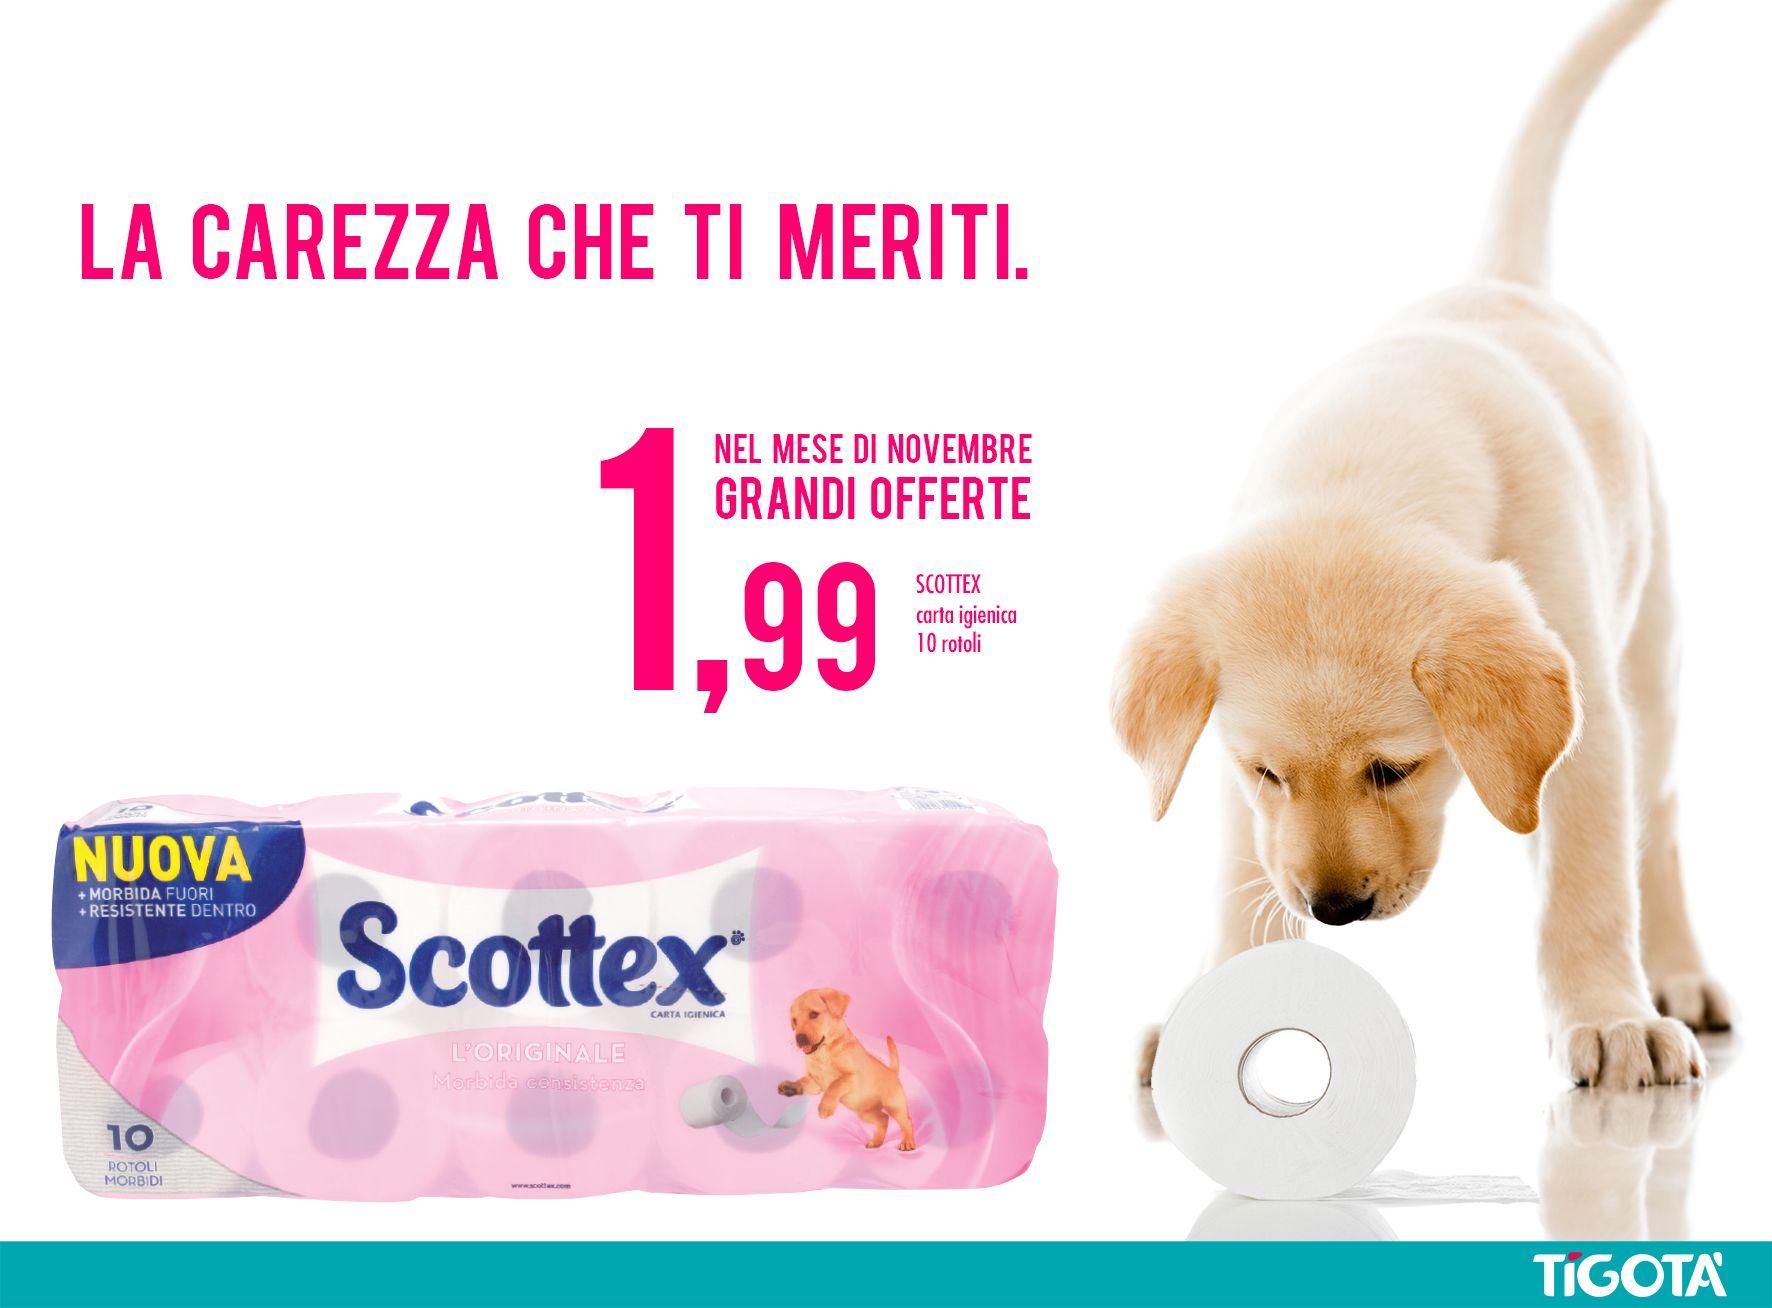 SCOTTEX CARTA IGIENICA LORIGINALE 10 ROTOLI